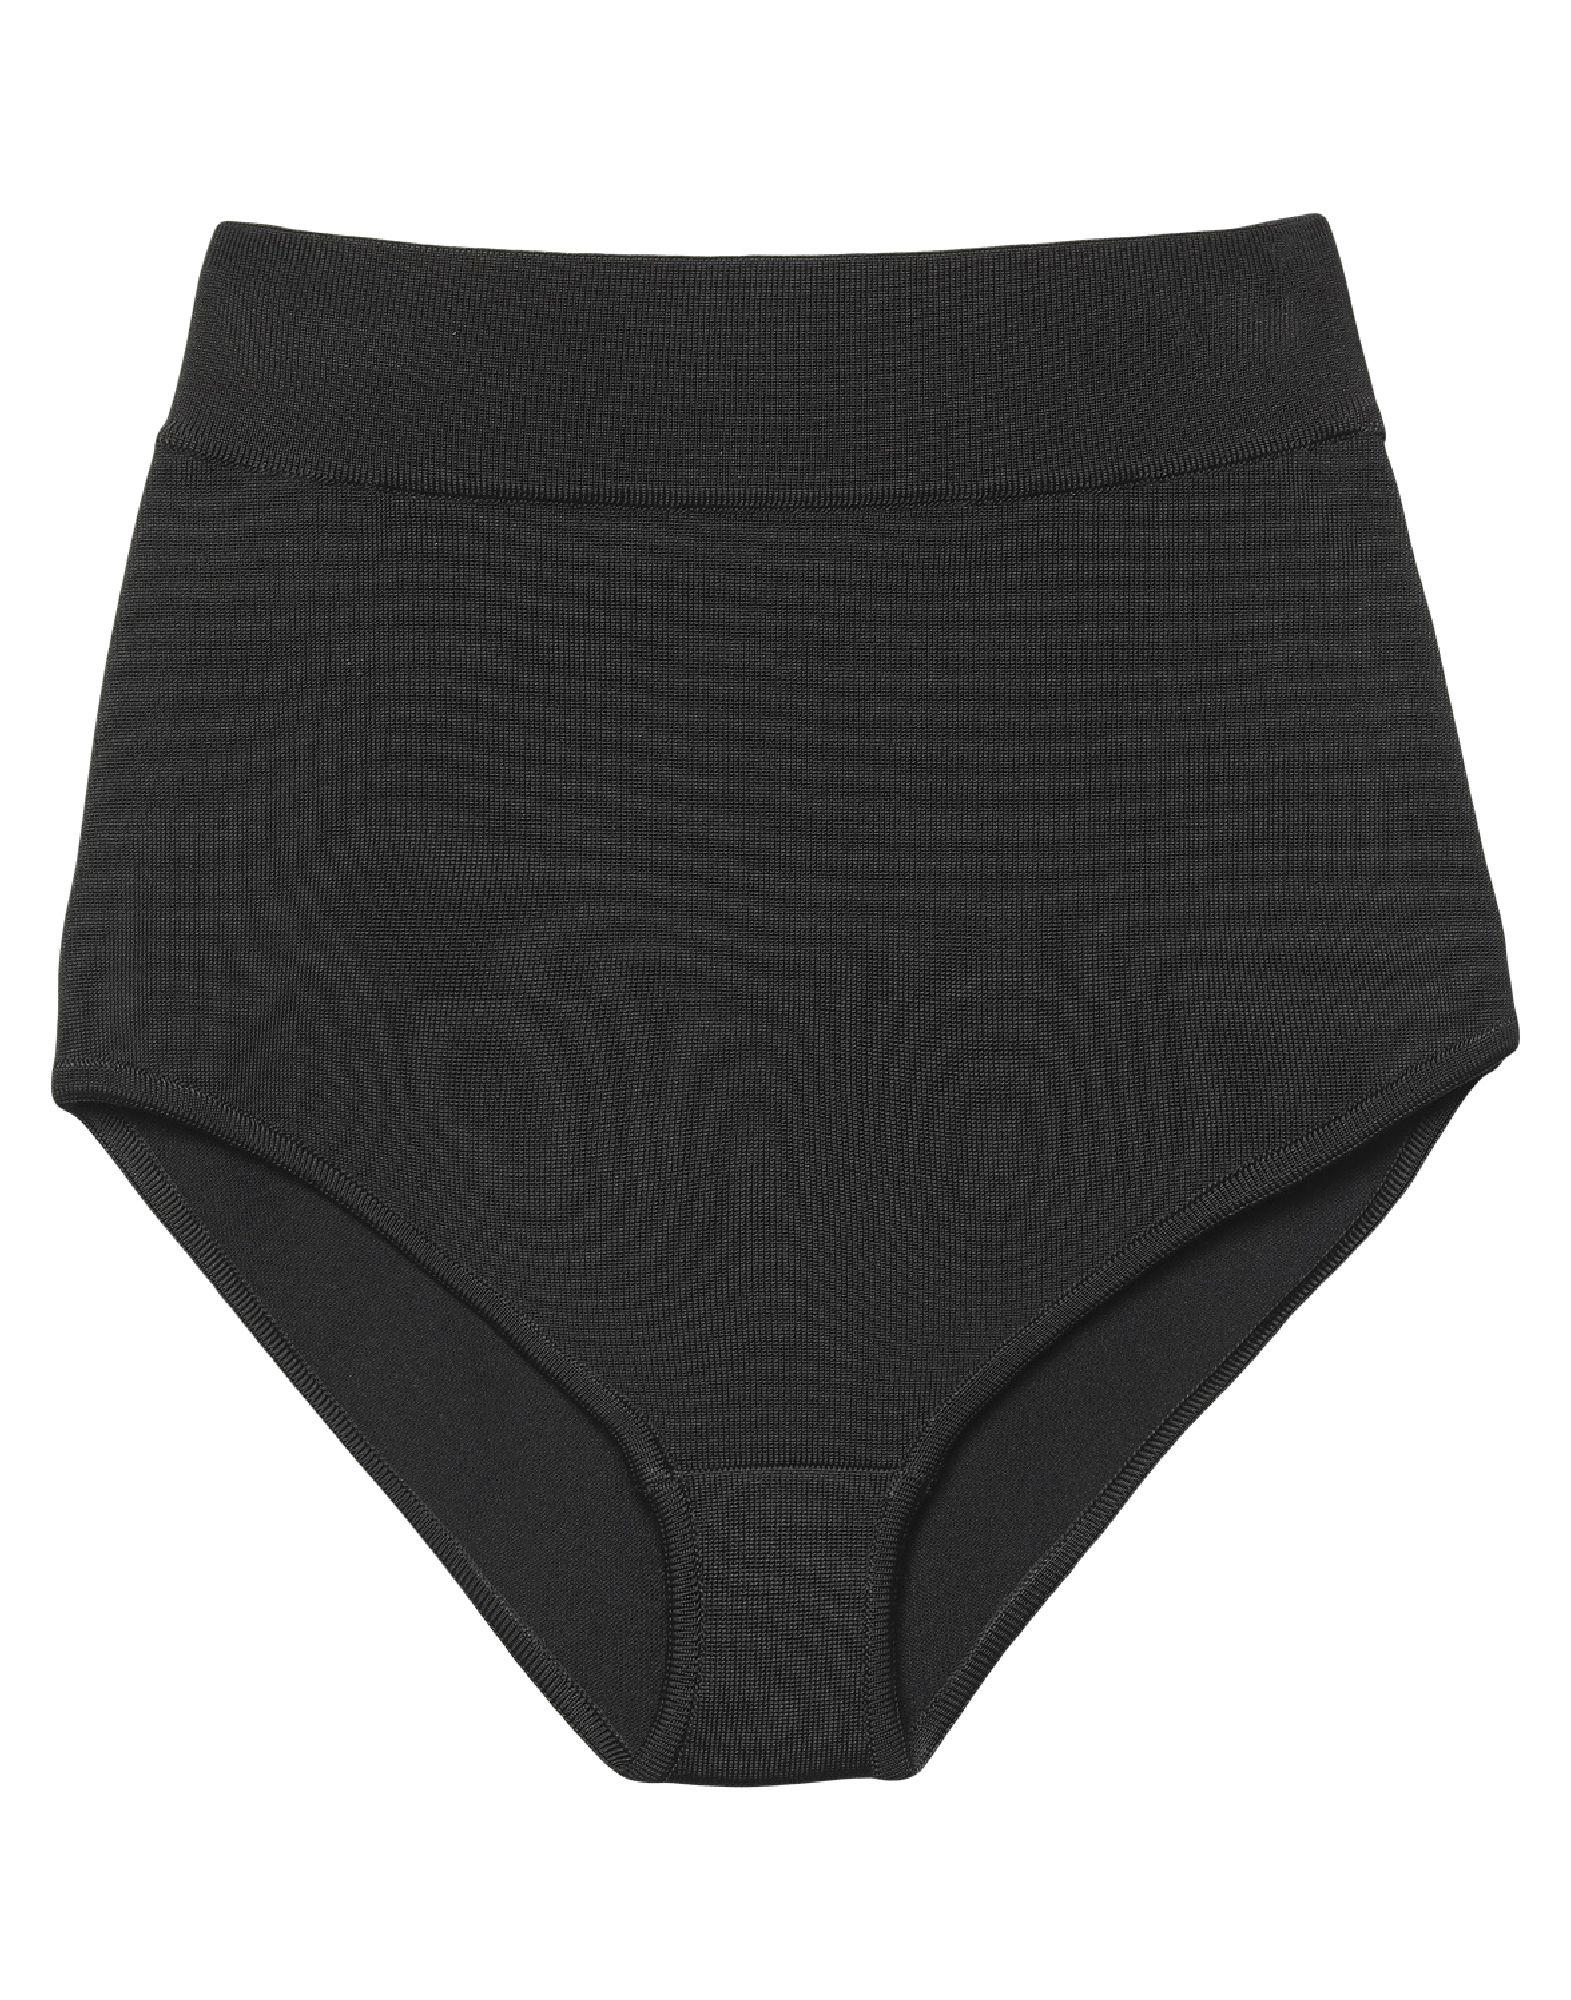 BALMAIN Boyshorts. knitted, no appliqués, lightweight knit, basic solid color, stretch. 83% Viscose, 15% Polyamide, 2% Elastane